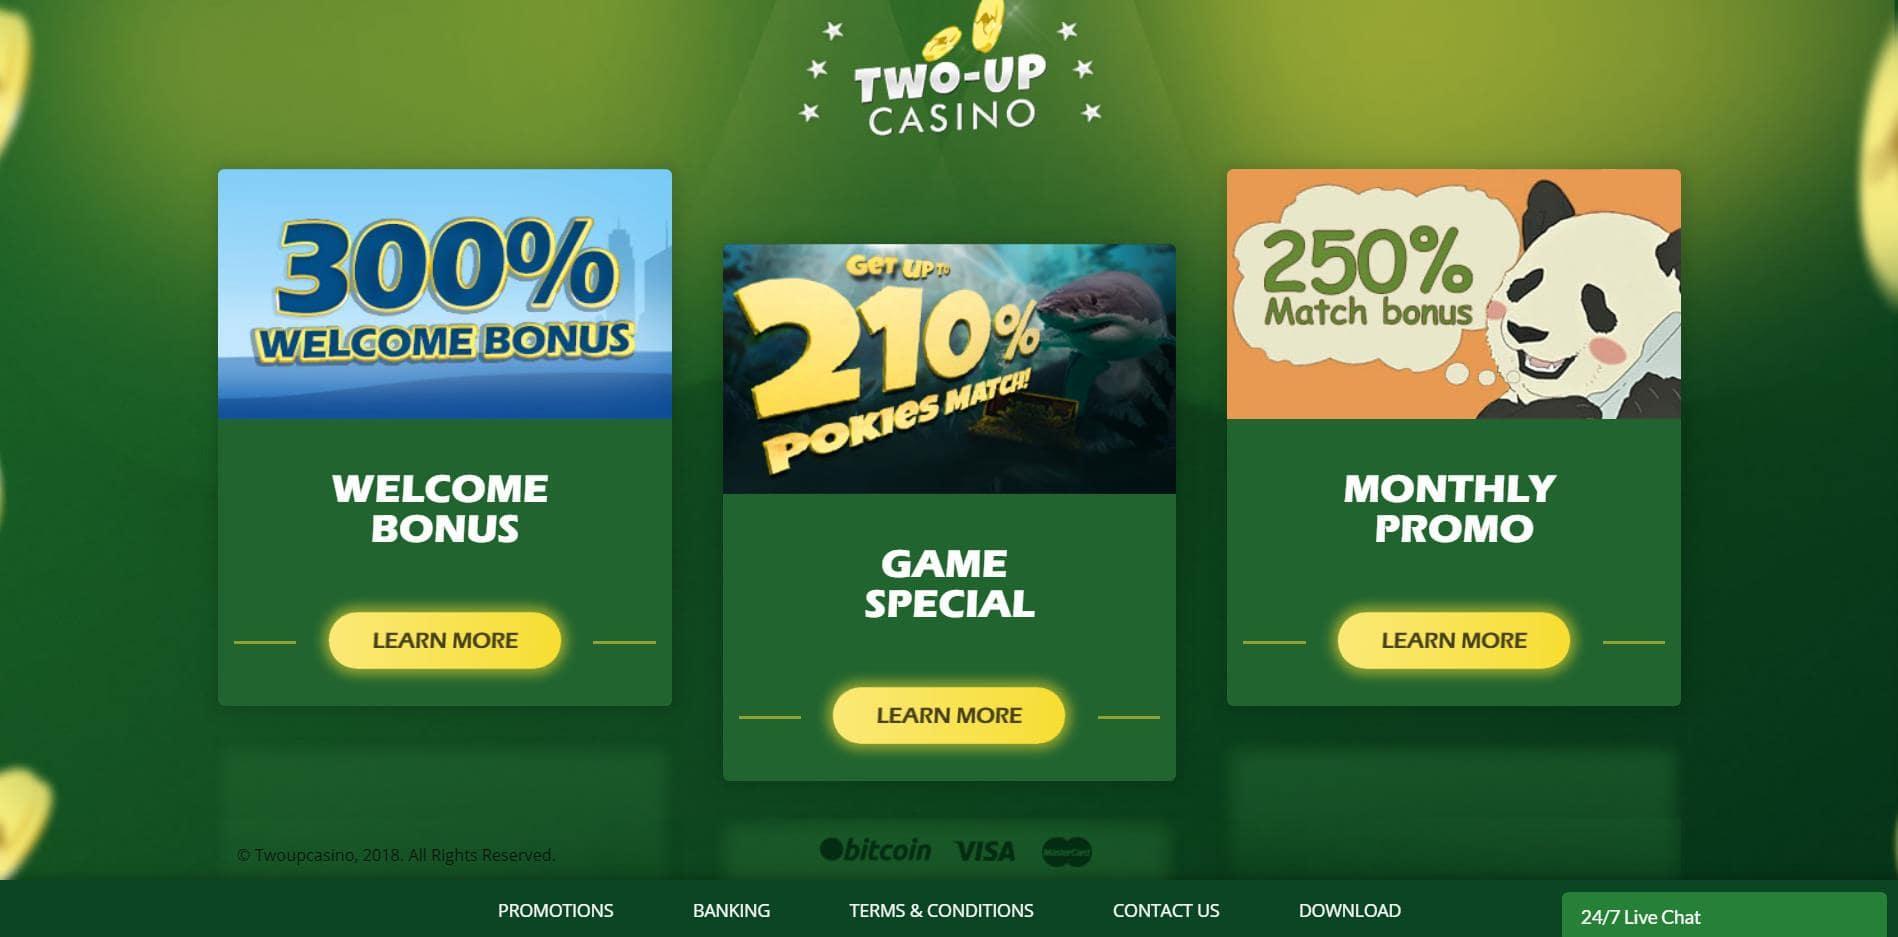 Two-Up Promo bonuses